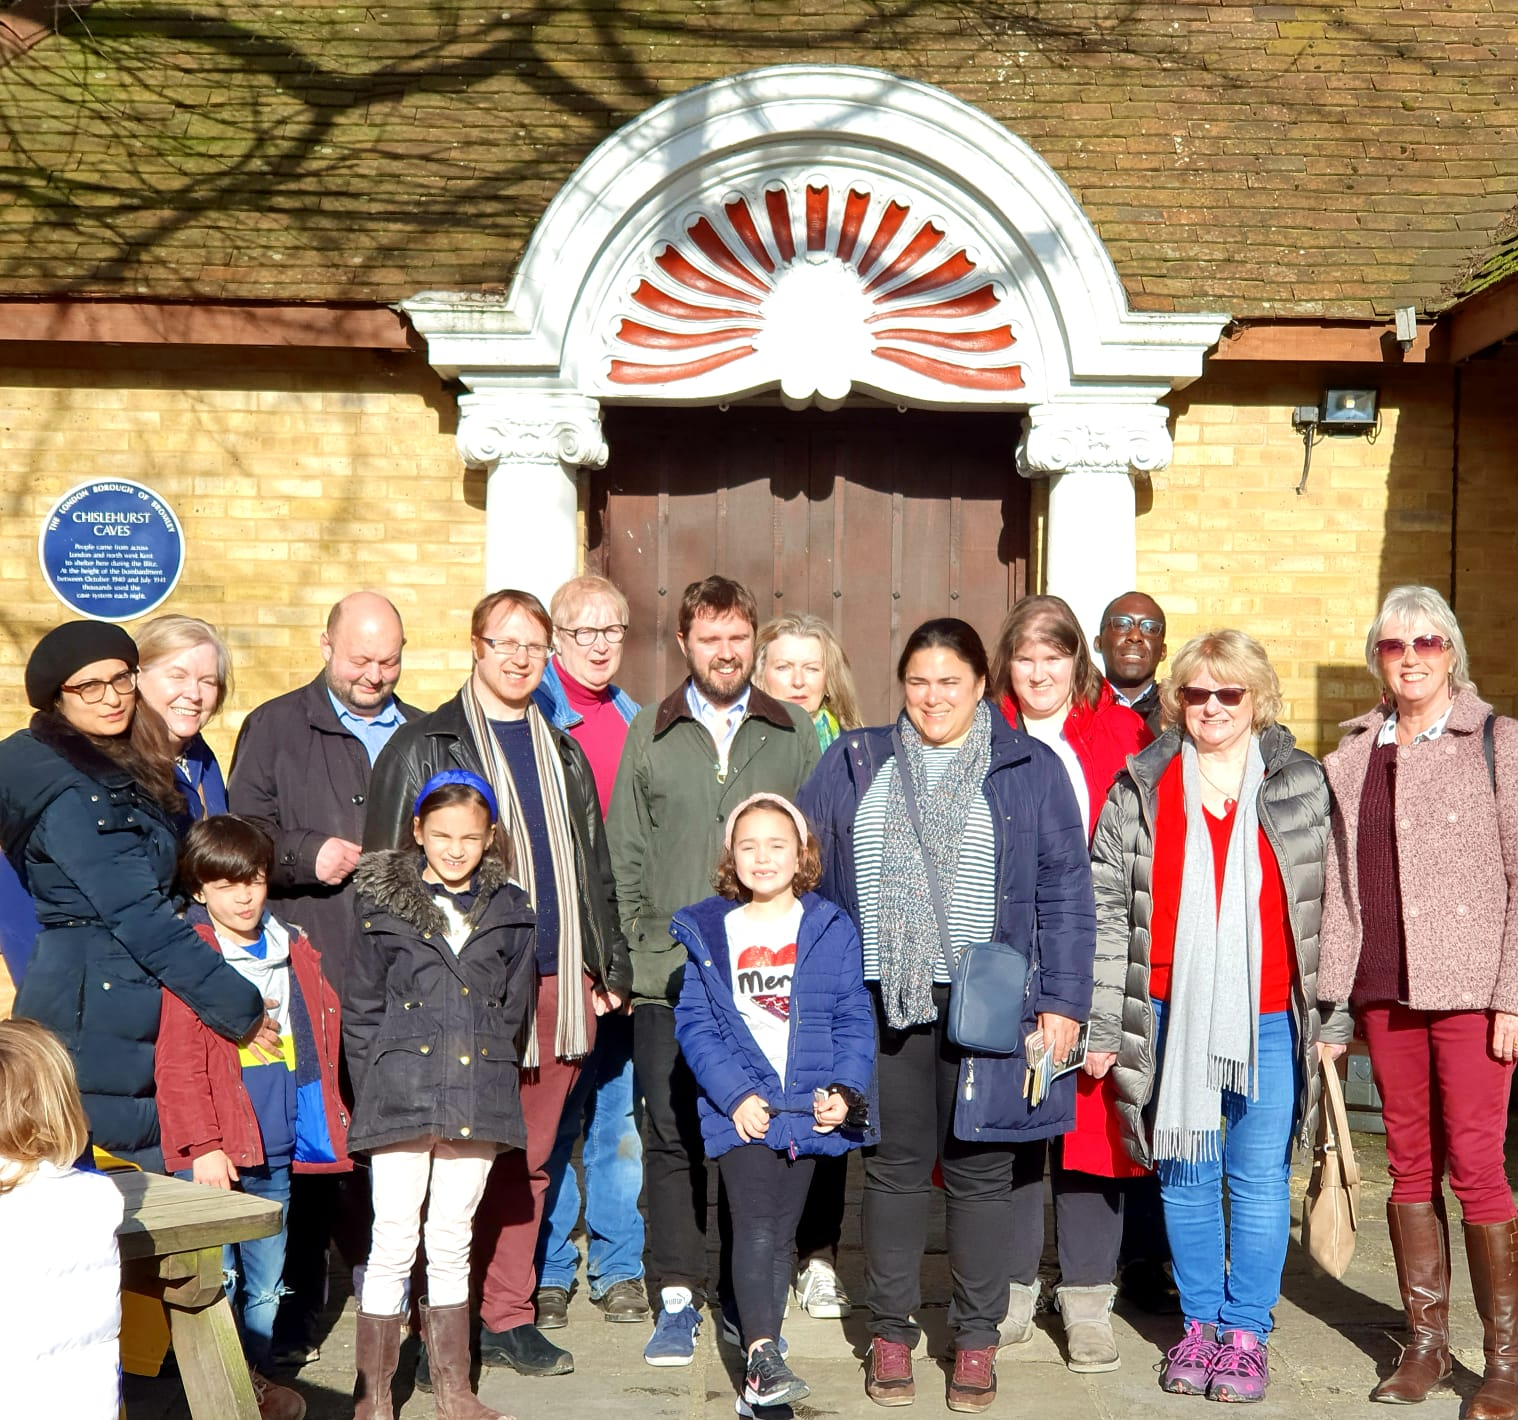 Bromley Lib Dems visit Chiselhurst Caves!